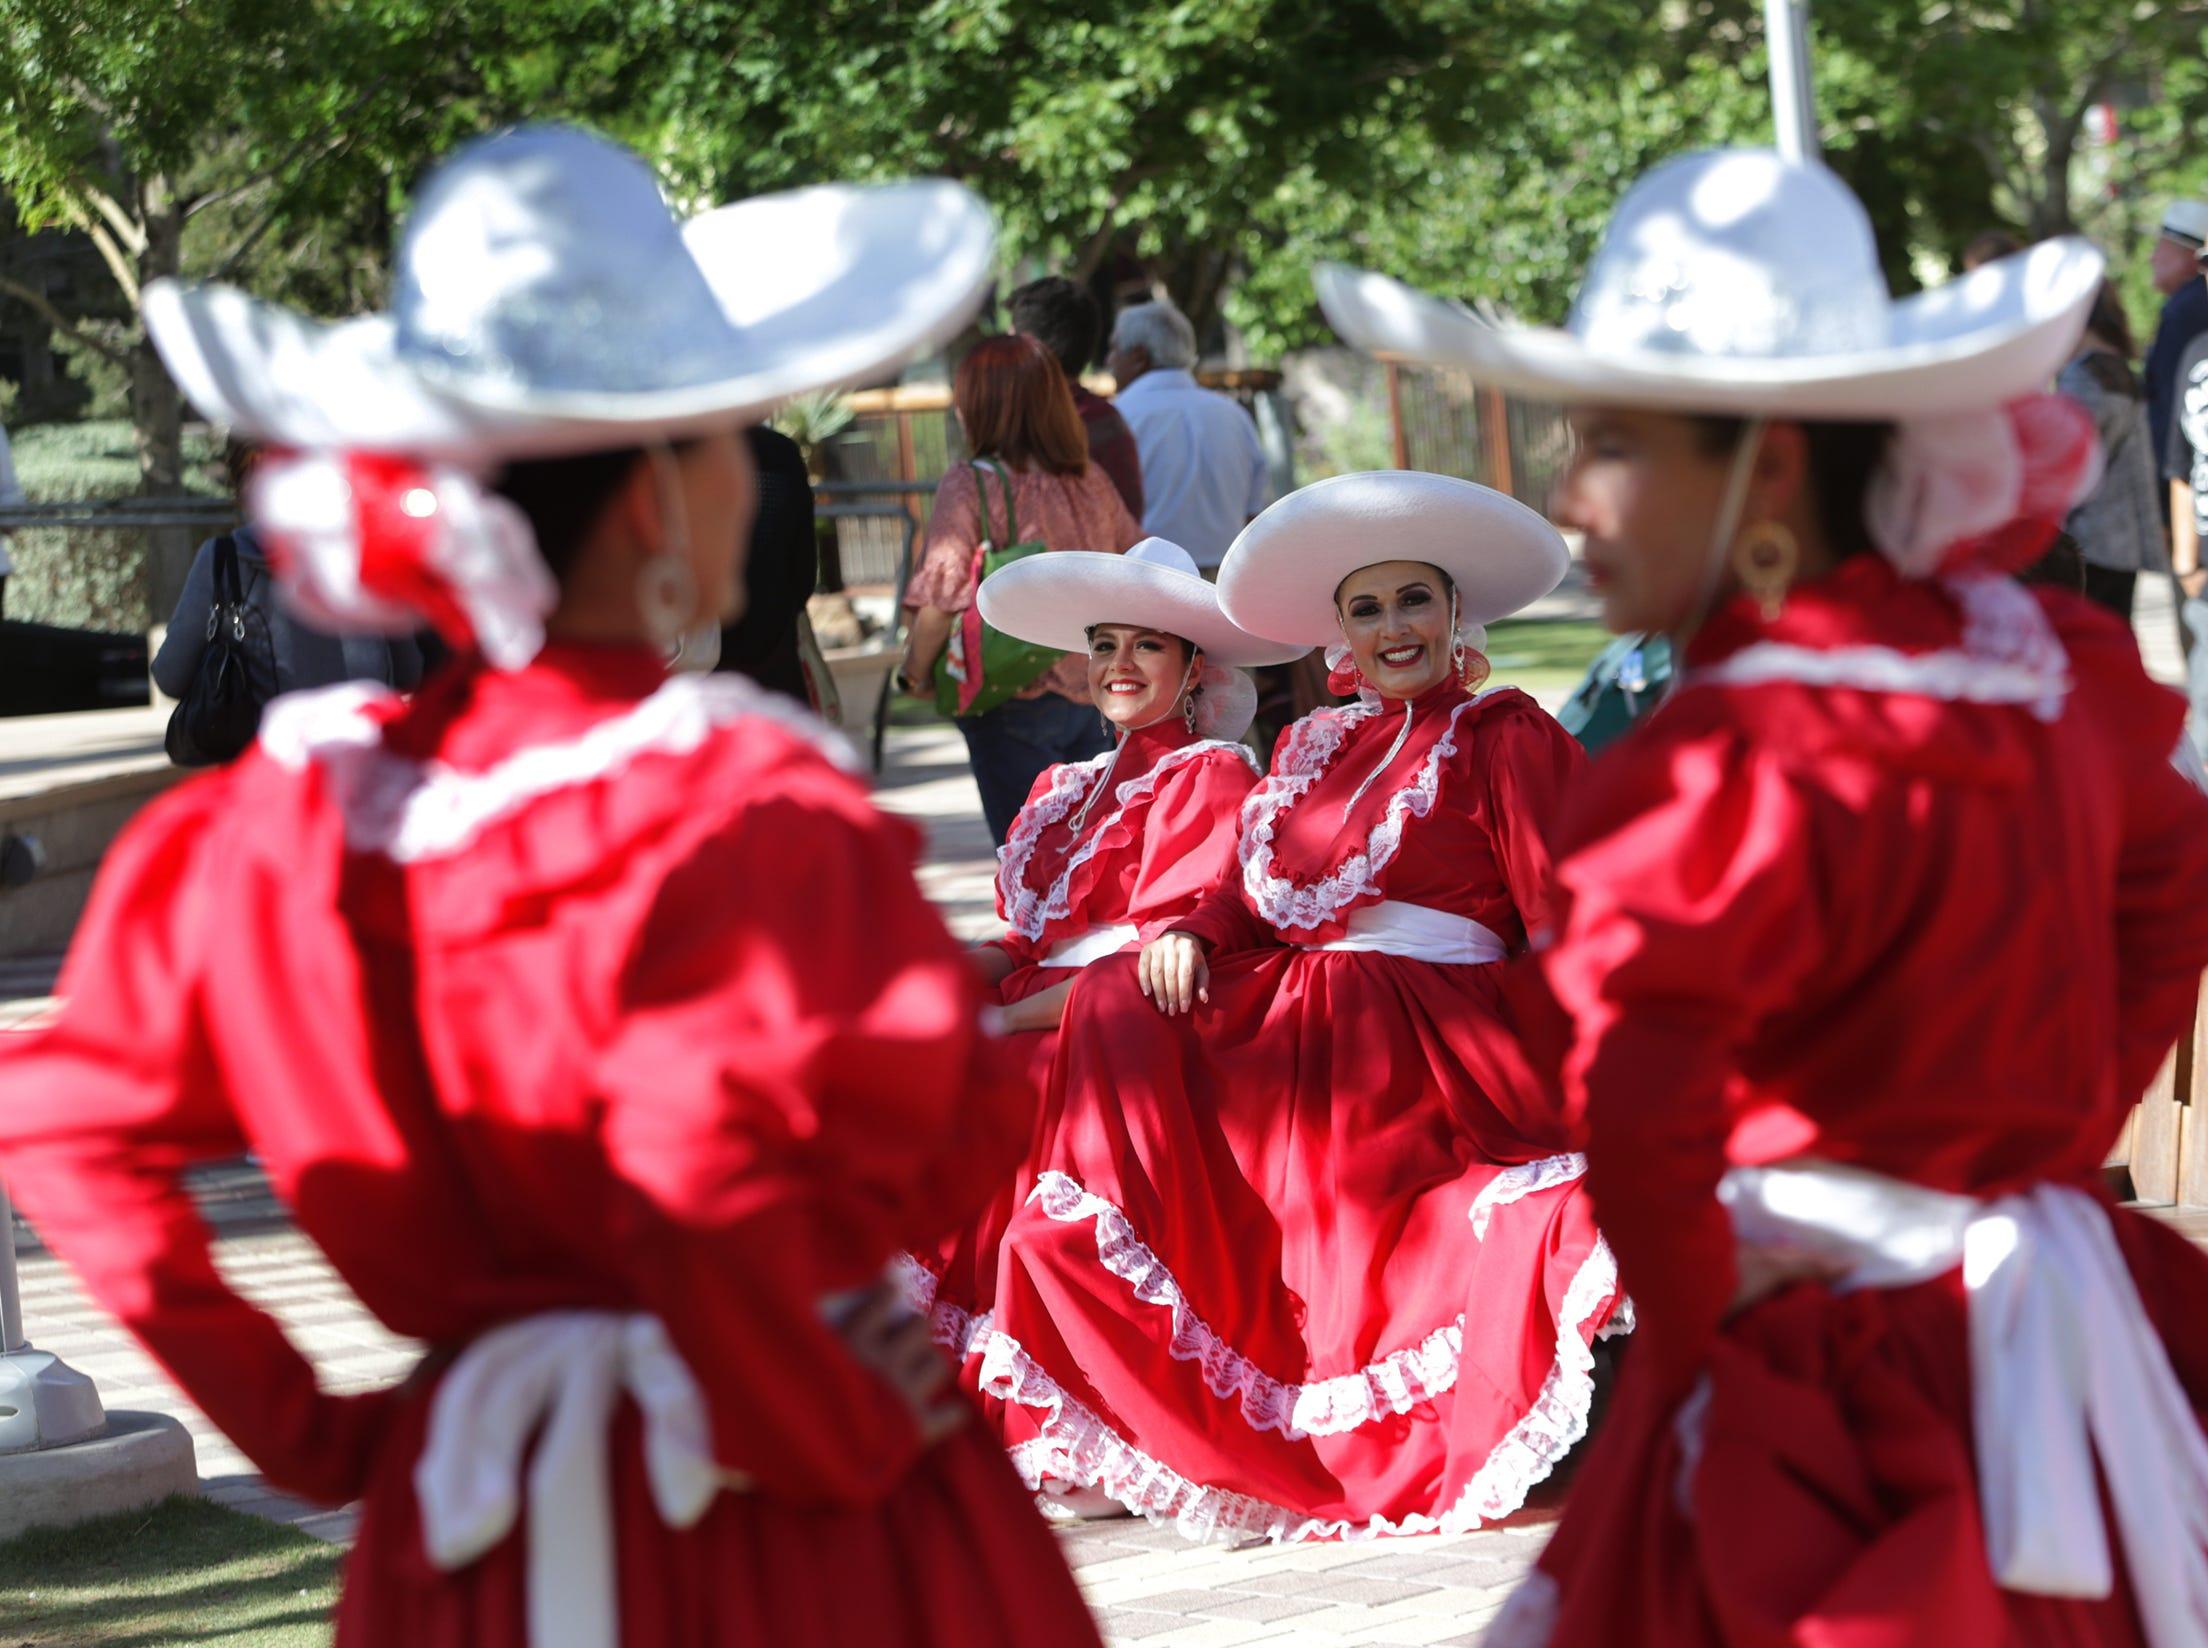 Hanks High School's Mariachi Los Trovadores and Danza Armayar open the 2019 Mariachi Loco Music Festival Friday at San Jacinto Plaza.